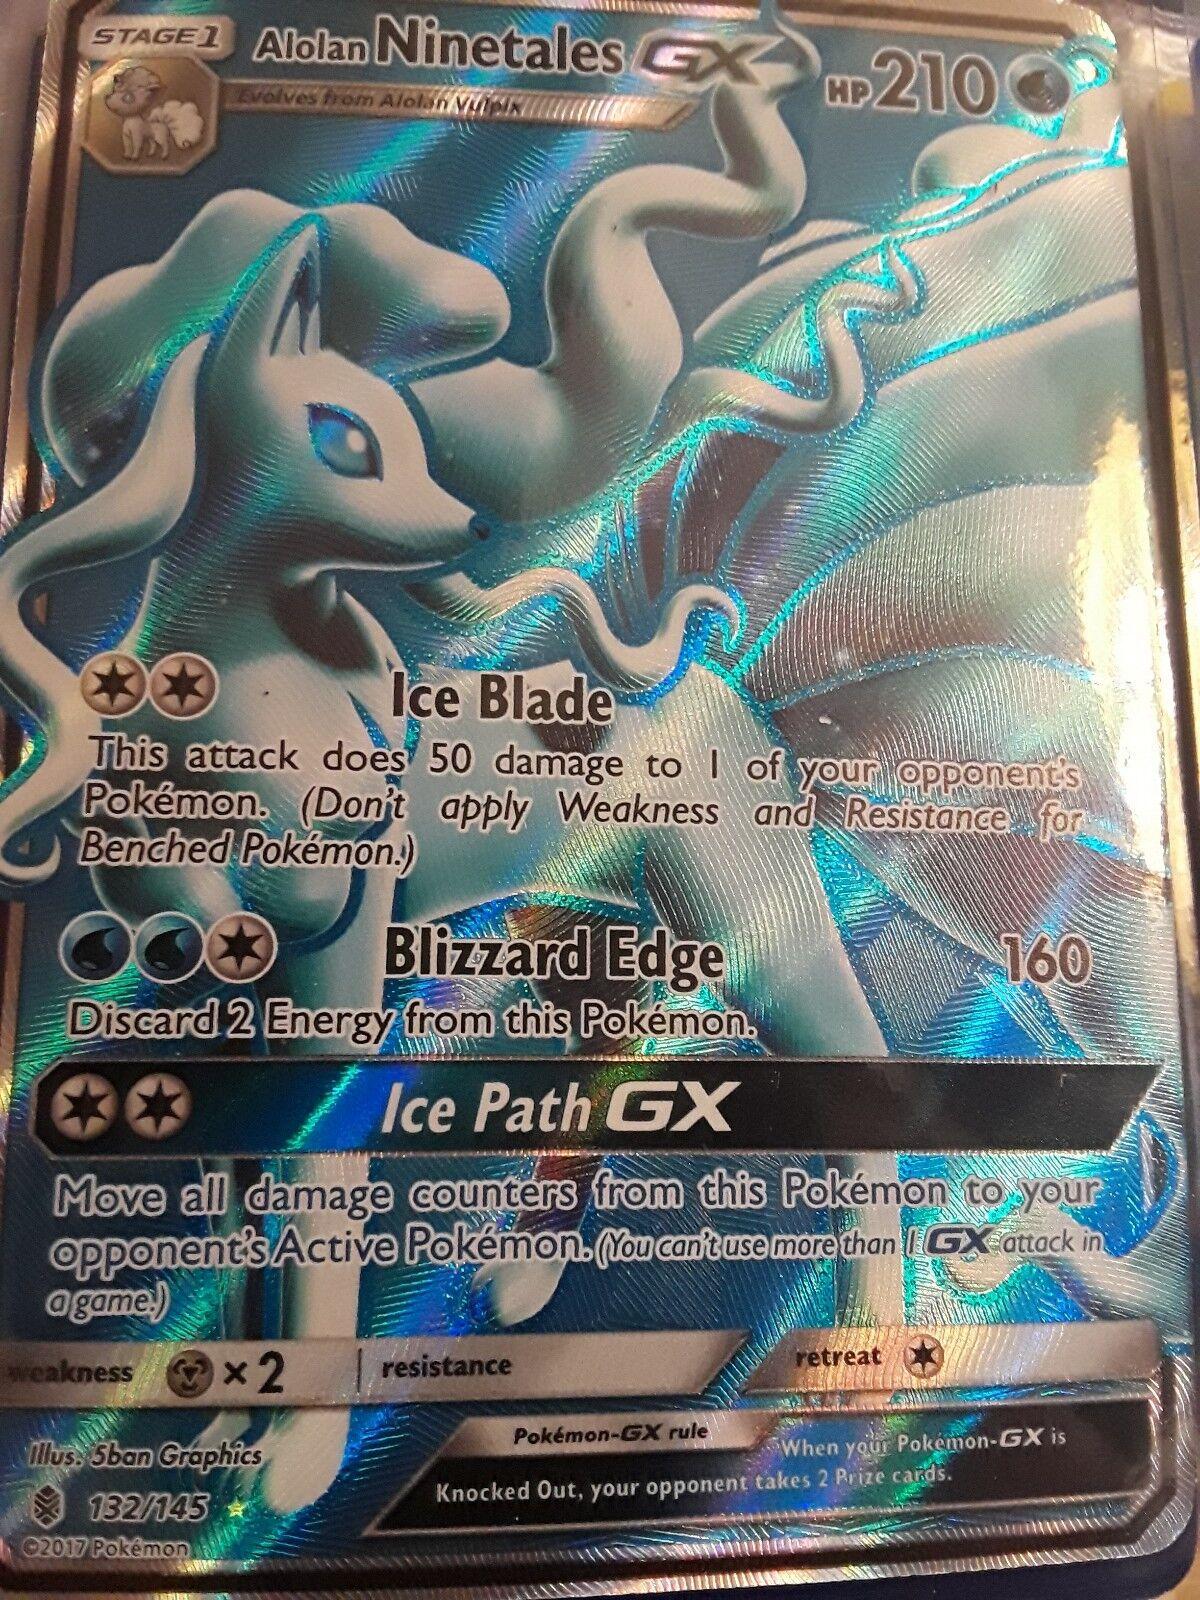 Pokémon alolan ninetales gx   132 voller kunst ultra selten wächter steigende nm   g16